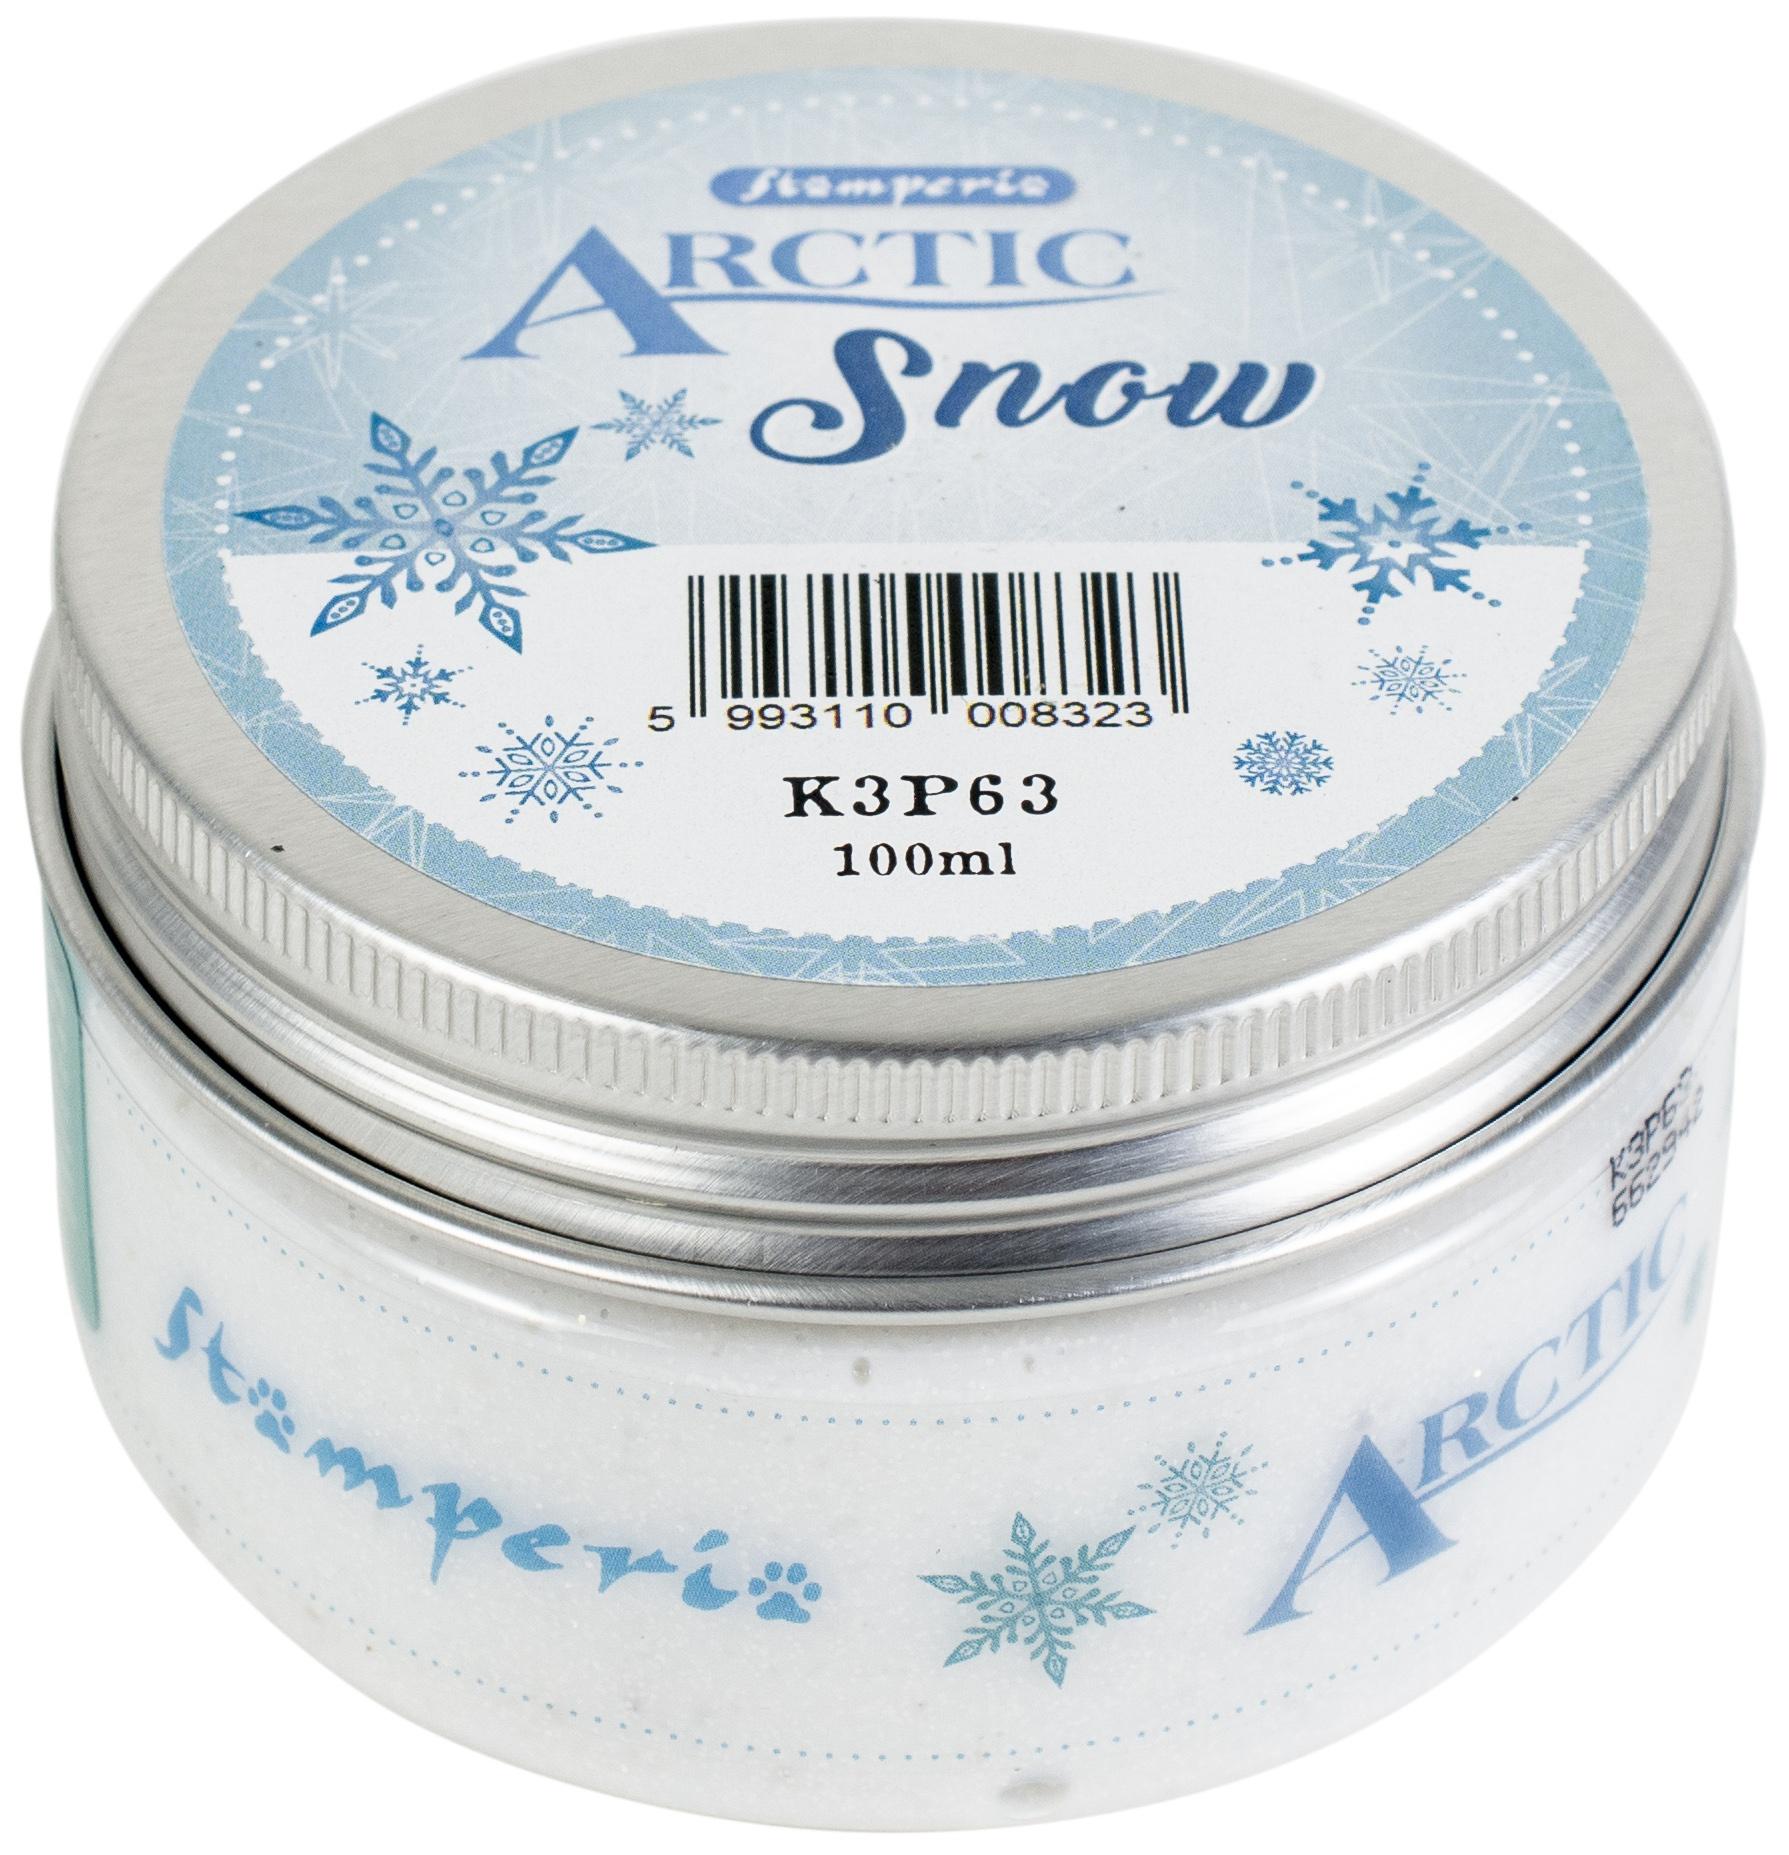 Stamperia Arctic Snow 100ml-White